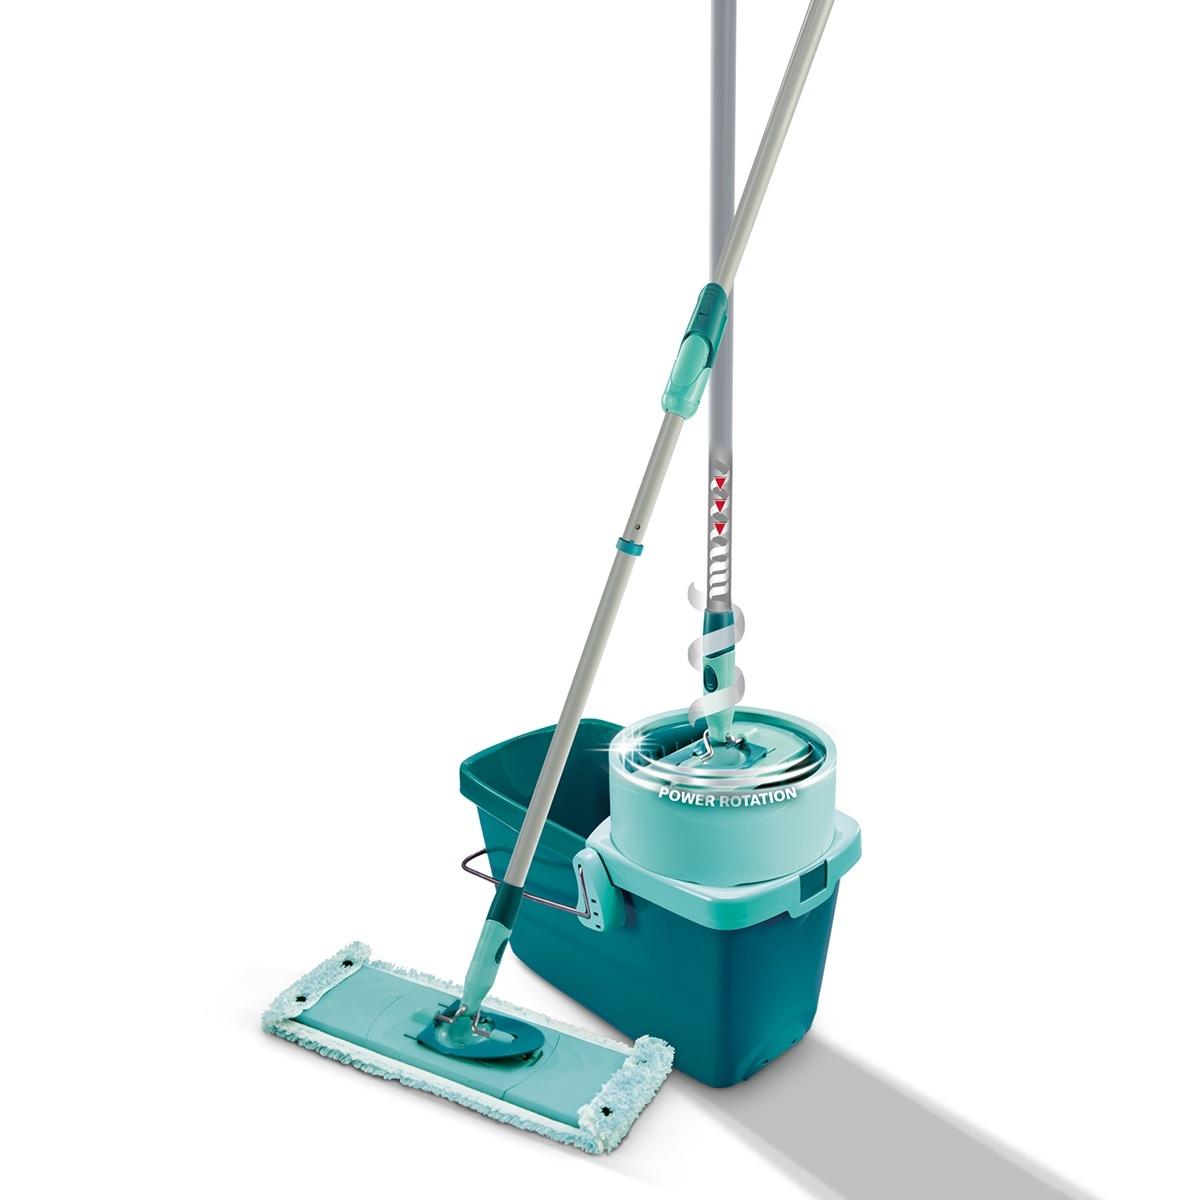 Leifheit Clean Twist extra soft Mset curăţenie imagine 2021 e4home.ro